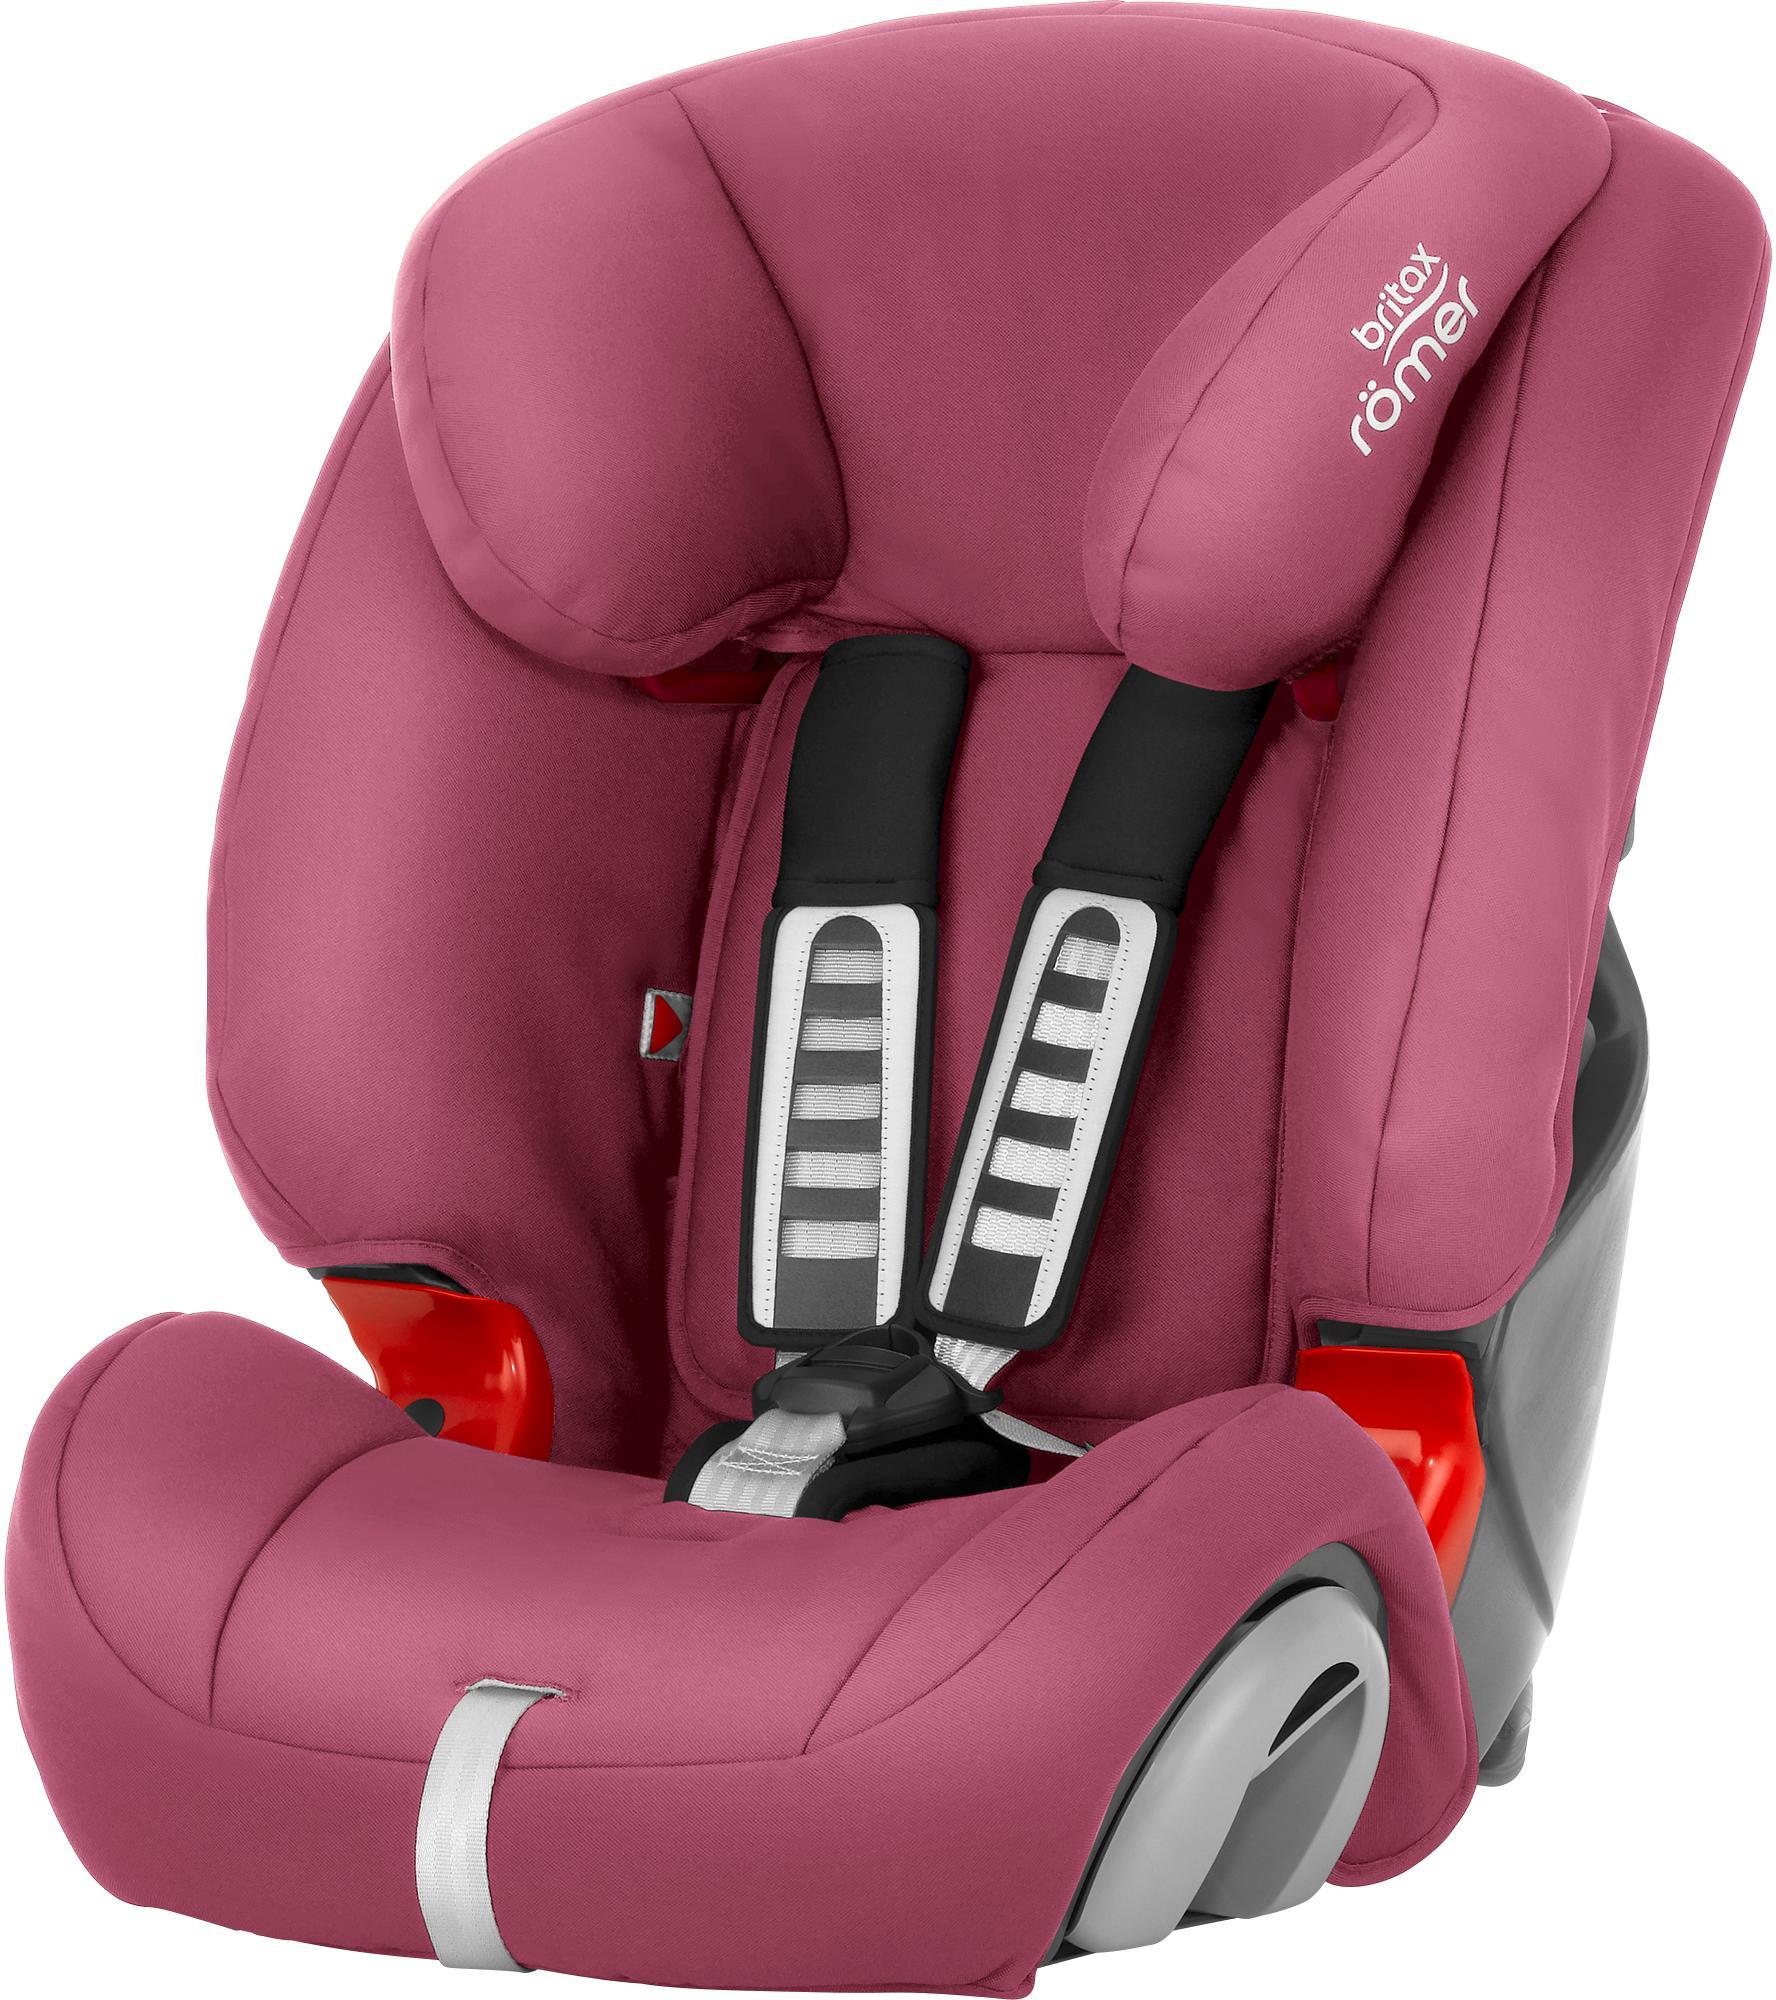 Britax Roemer Evolva 123 Car Seat